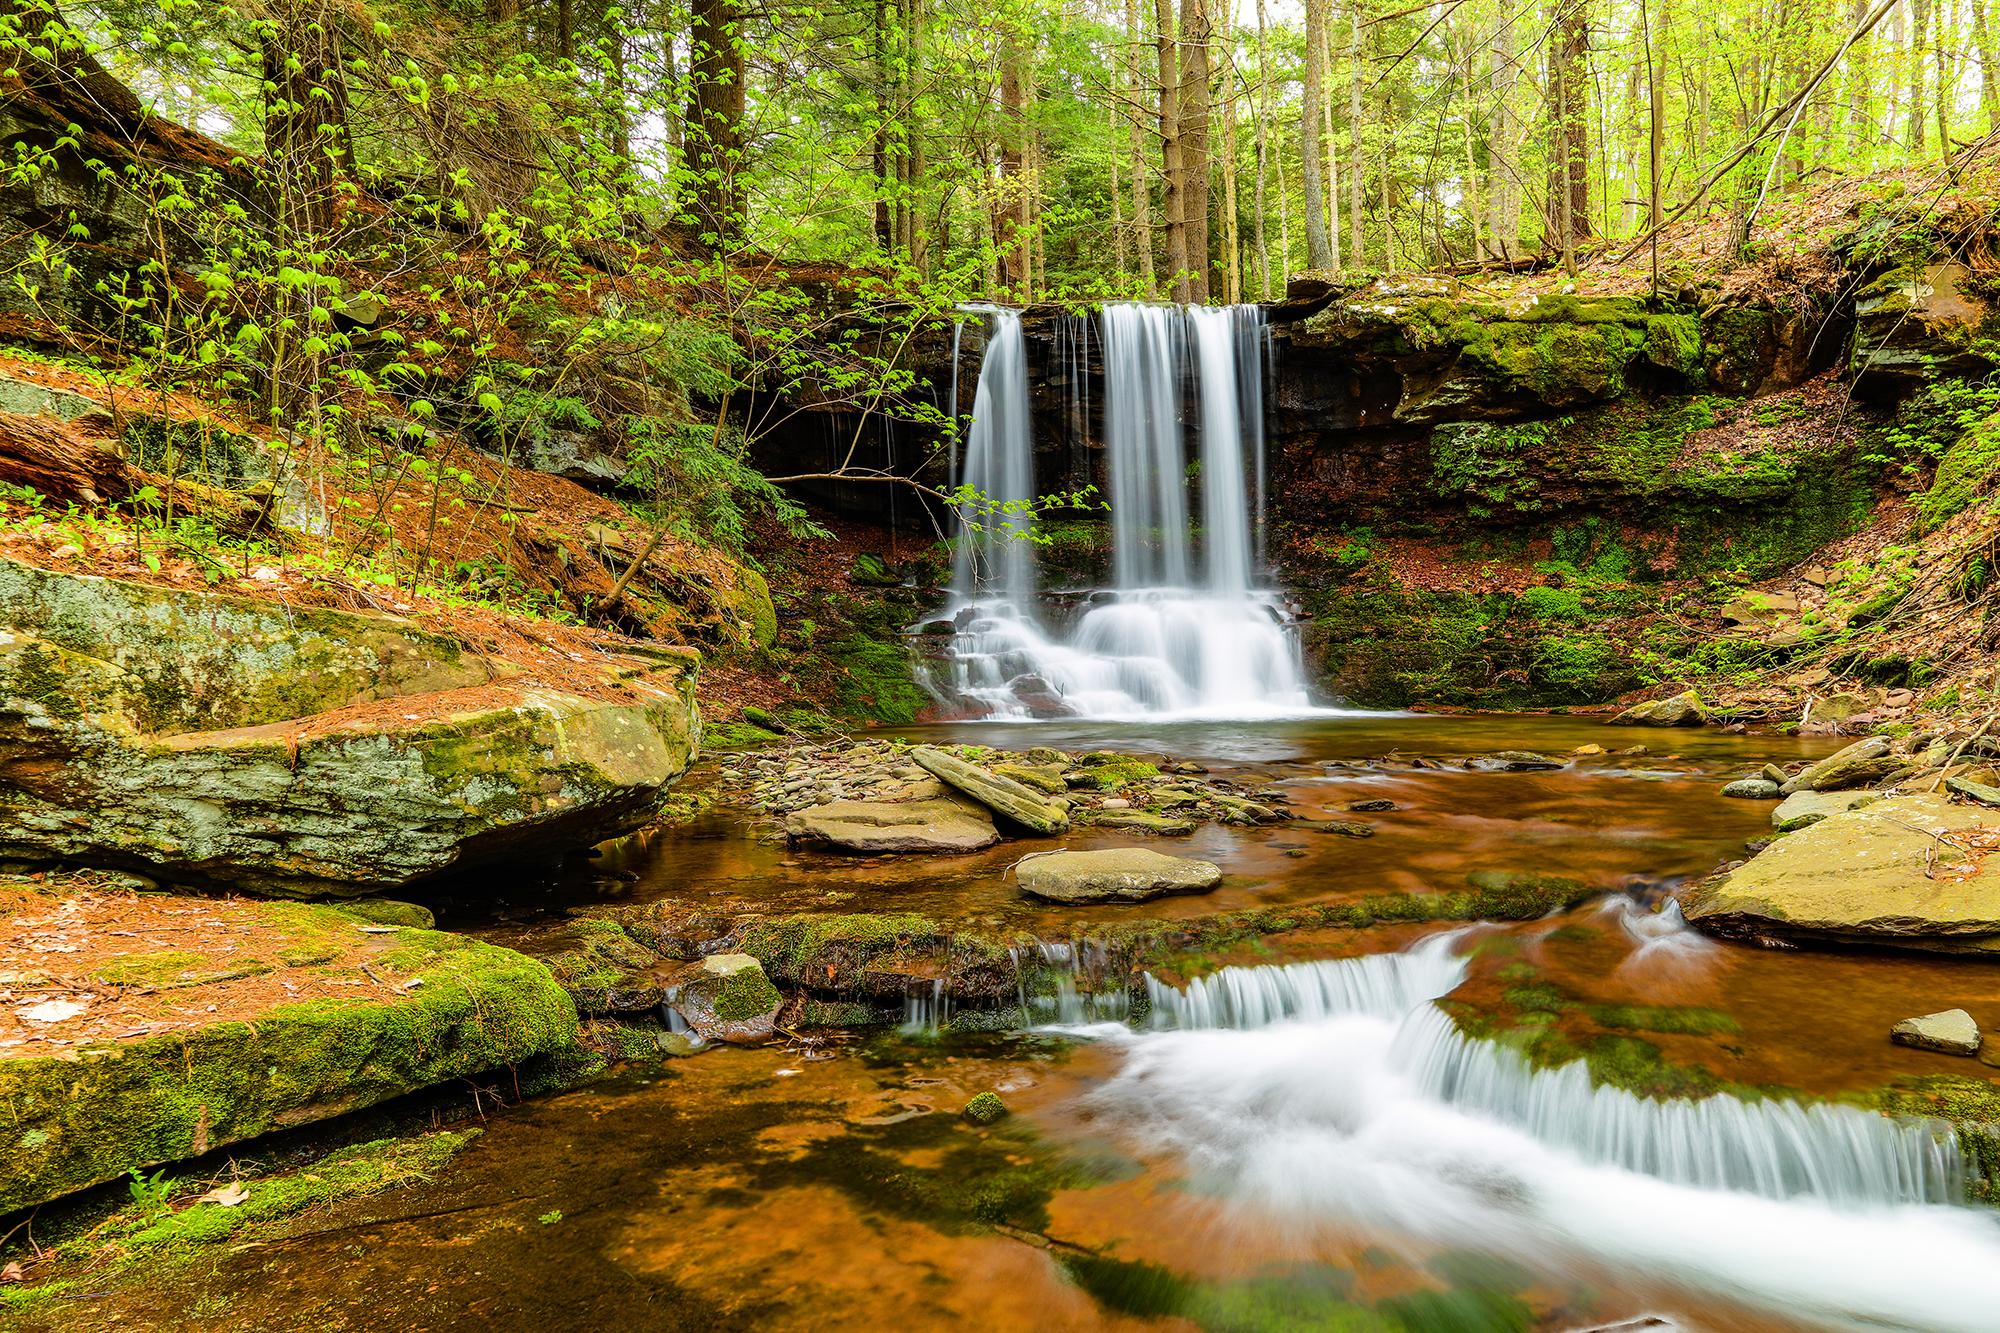 Diamond Noth. Waterfalls